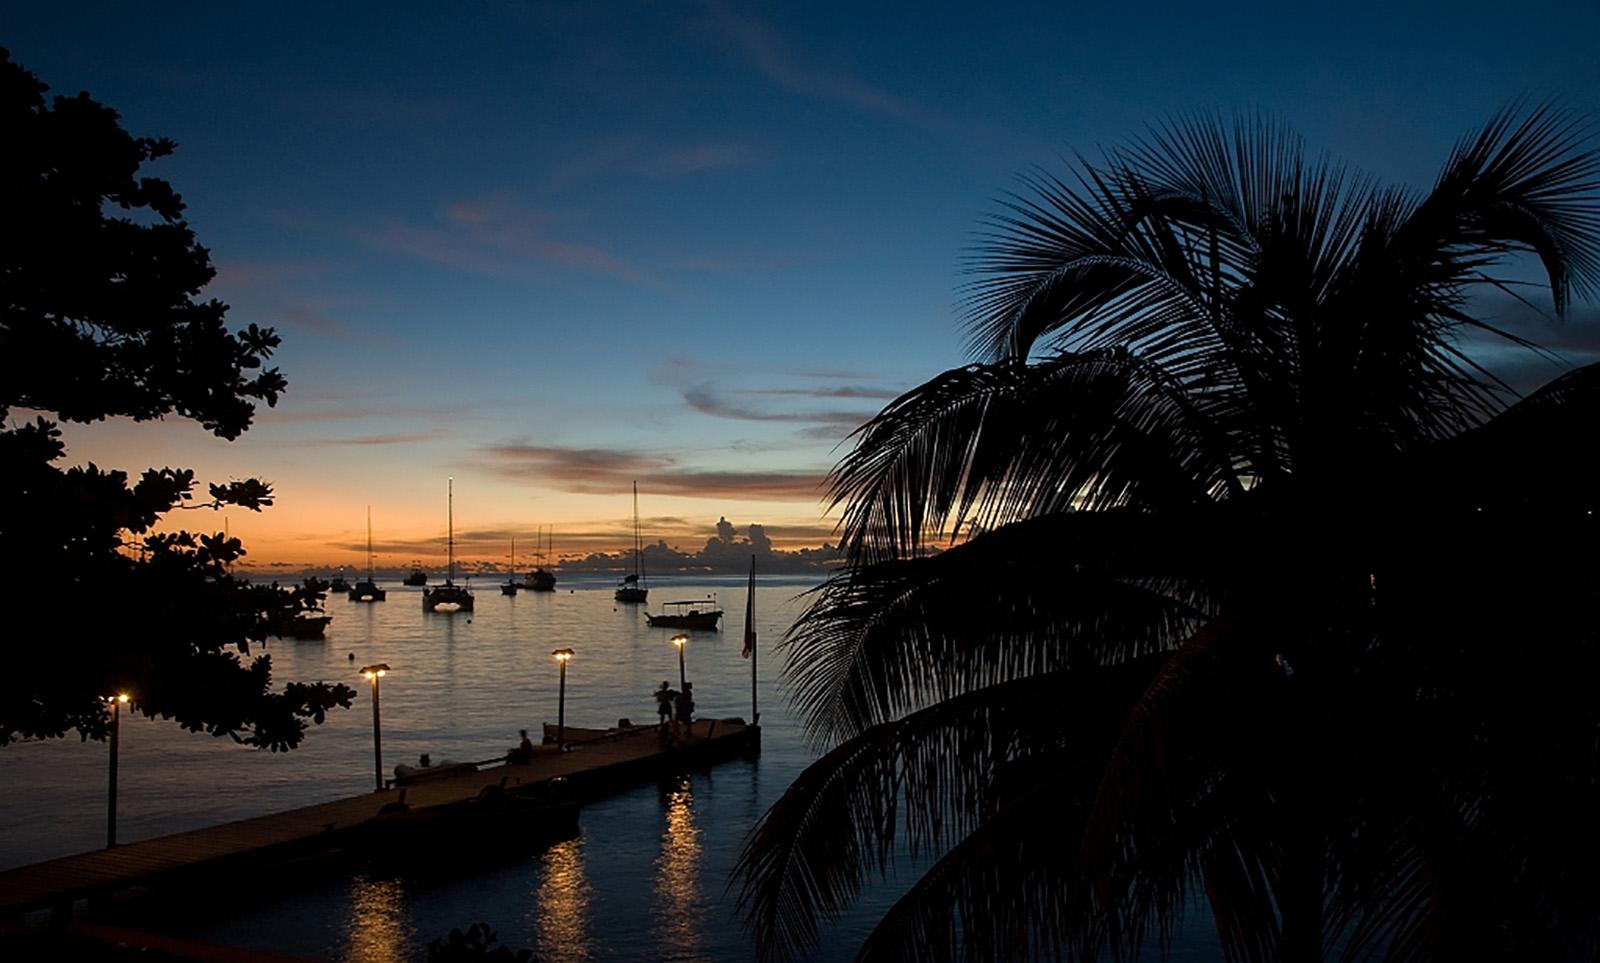 Sunset - Bequia